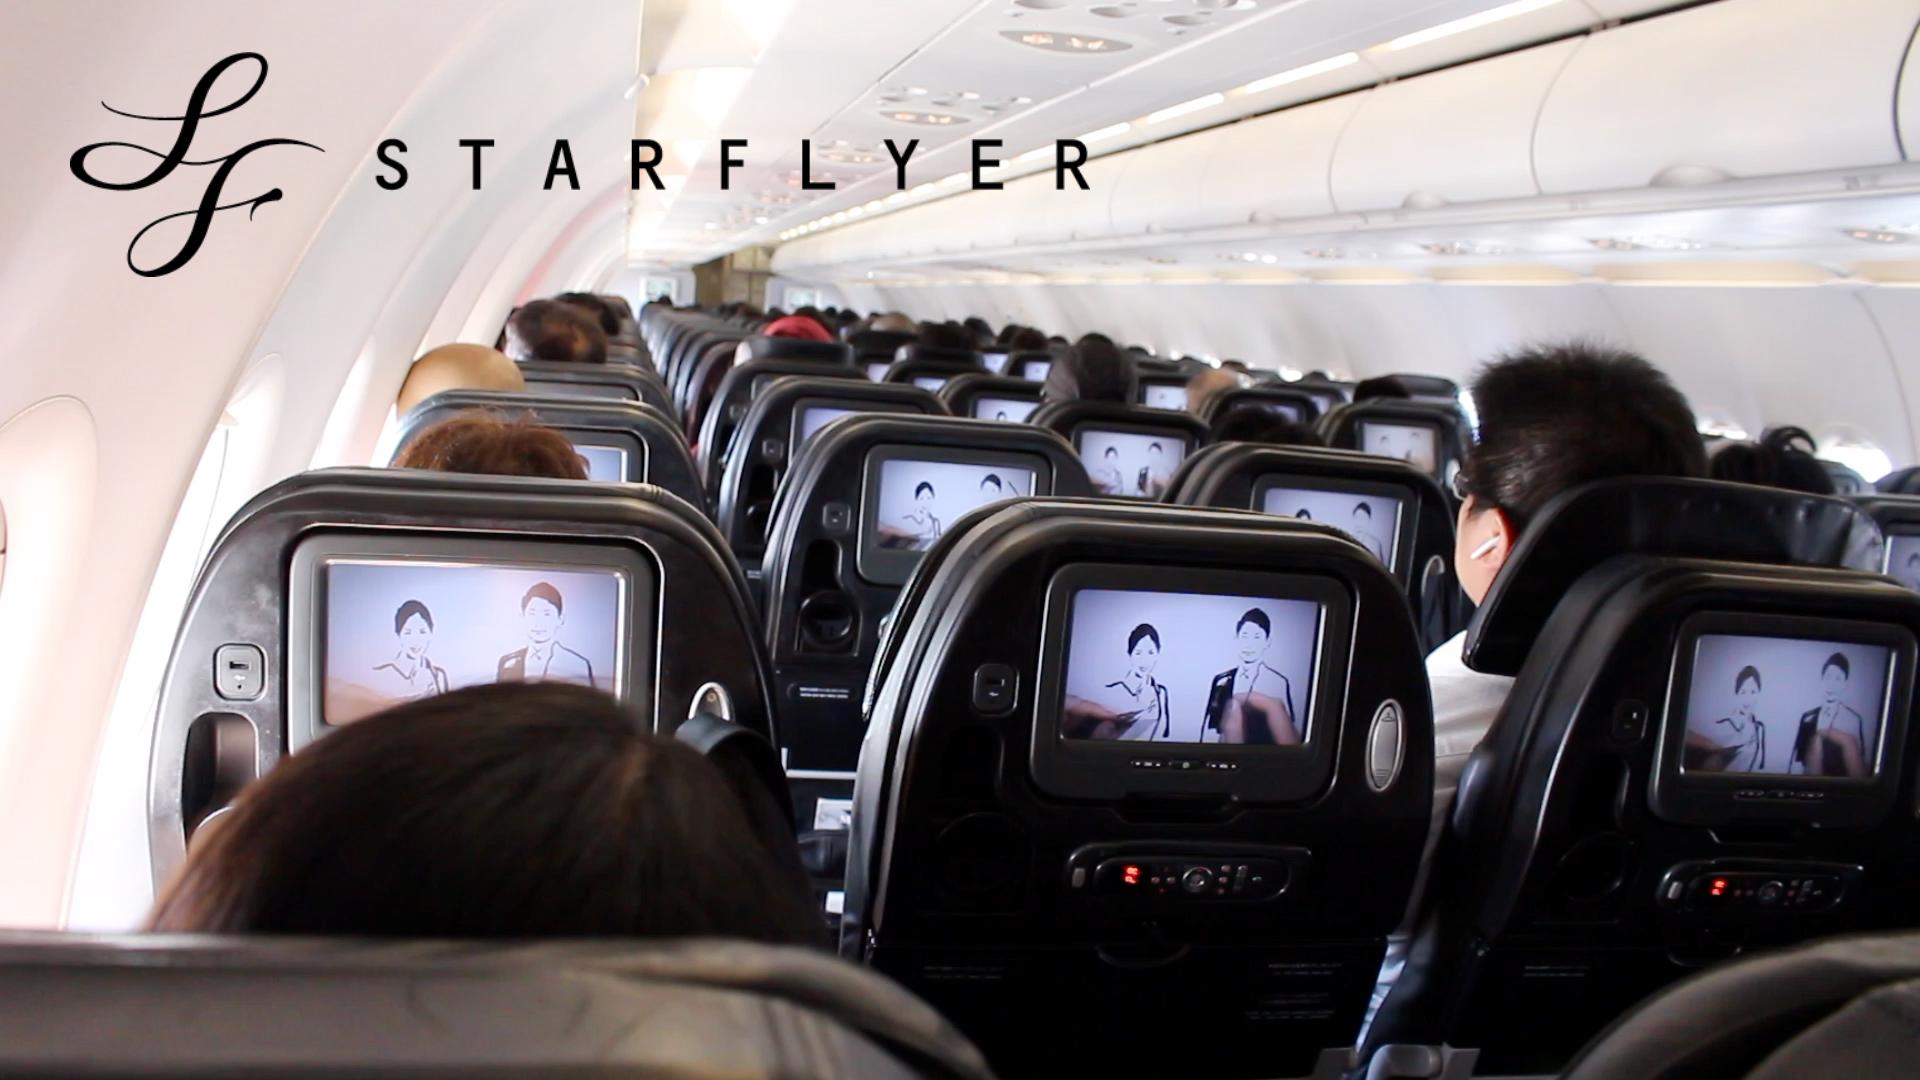 STARFLYER機内アナウンスビデオ